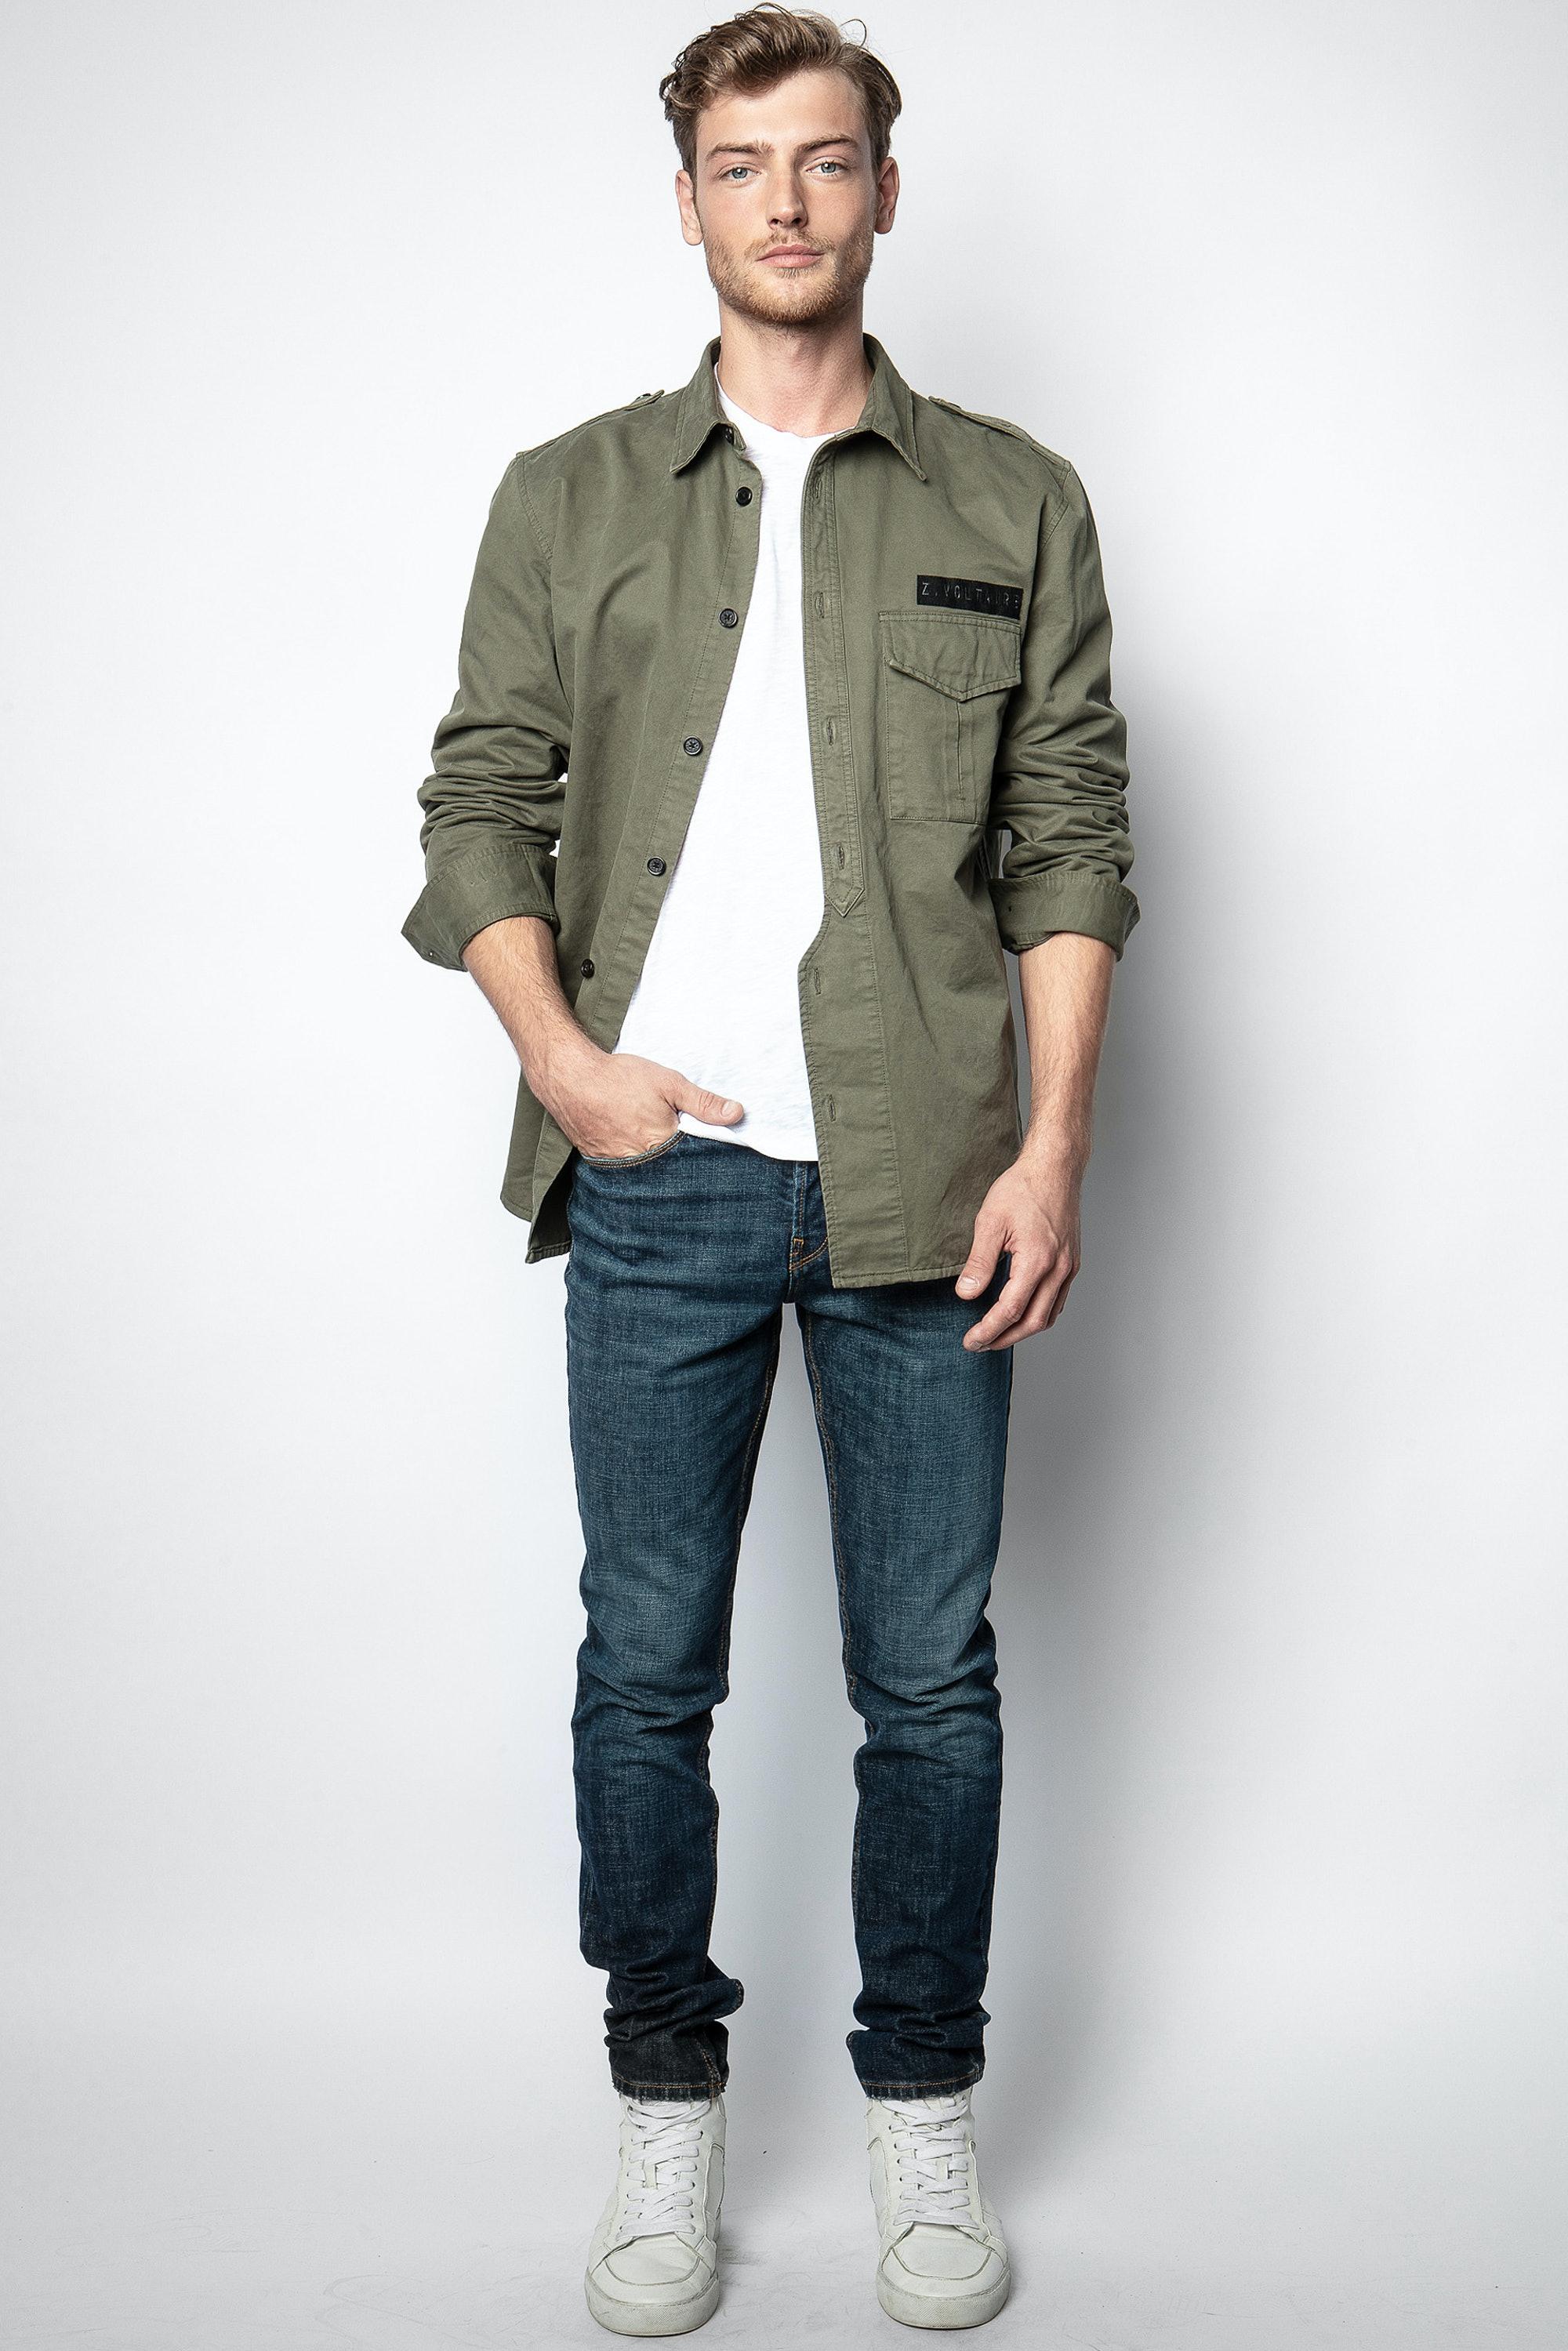 Serge Mili Dye Shirt